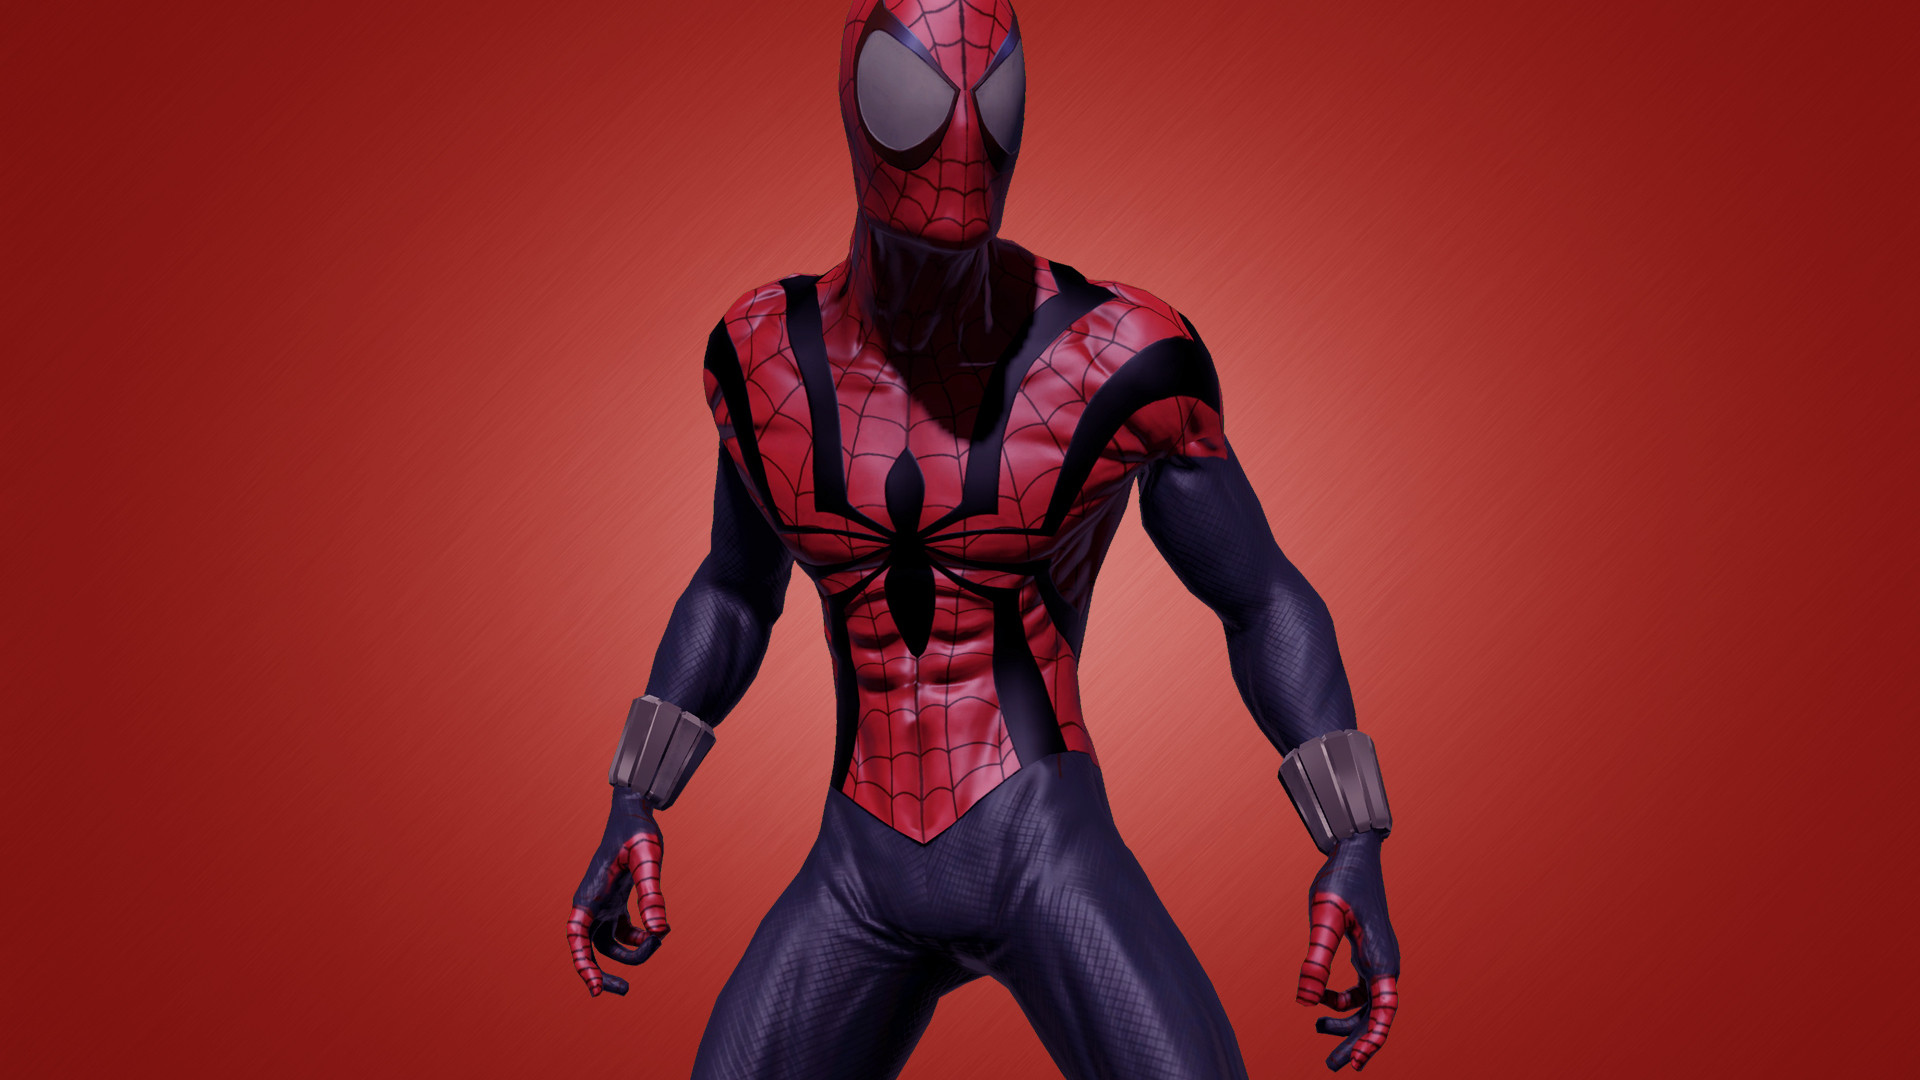 24 hd spiderman 3d wallpaper :: Spiderman Wallpapers